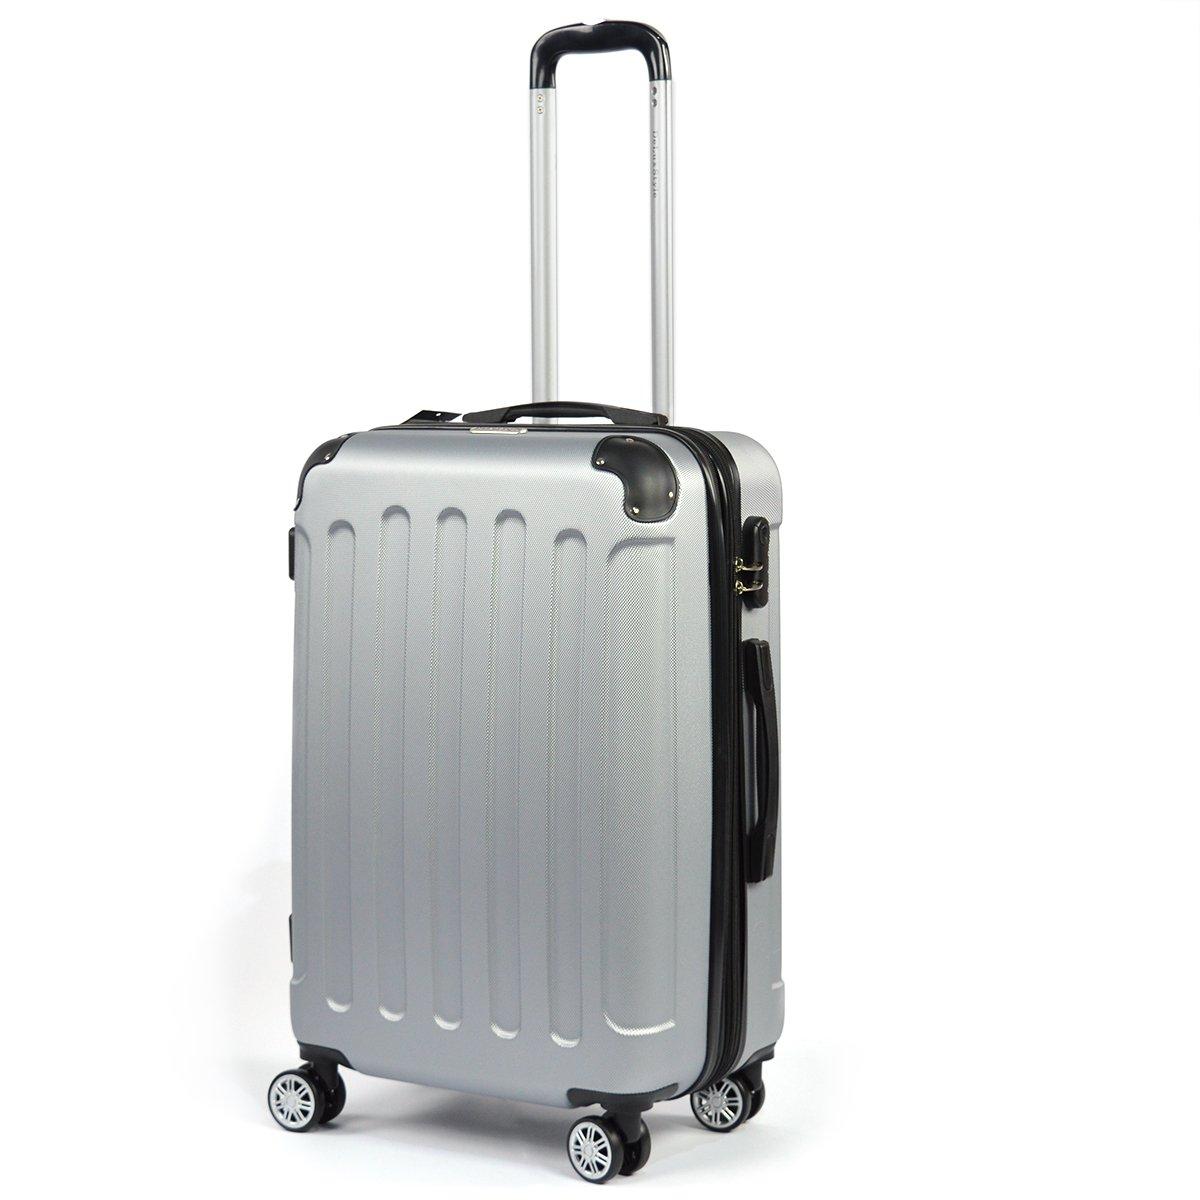 Flexot Reisekoffer - Trolley - Grö ß e M Koffer - Reisekoffer - Hartschale -4 Reifen - Dehnfalte - Doppelgriffe - Zwillingsreifen -Silber Flexot-M-Silber